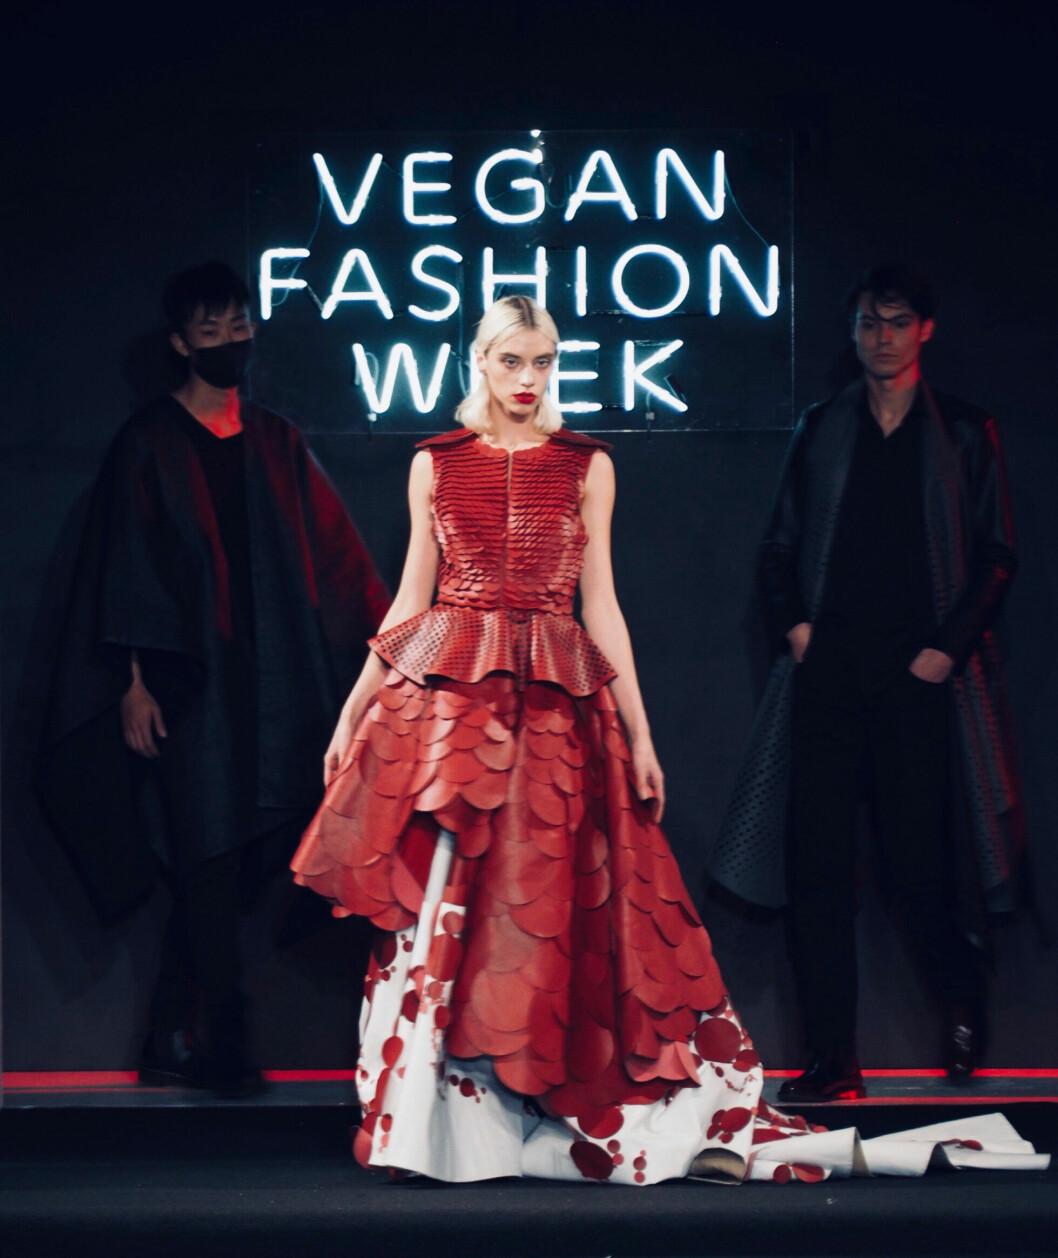 Vegan Fashion Week i Los Angeles